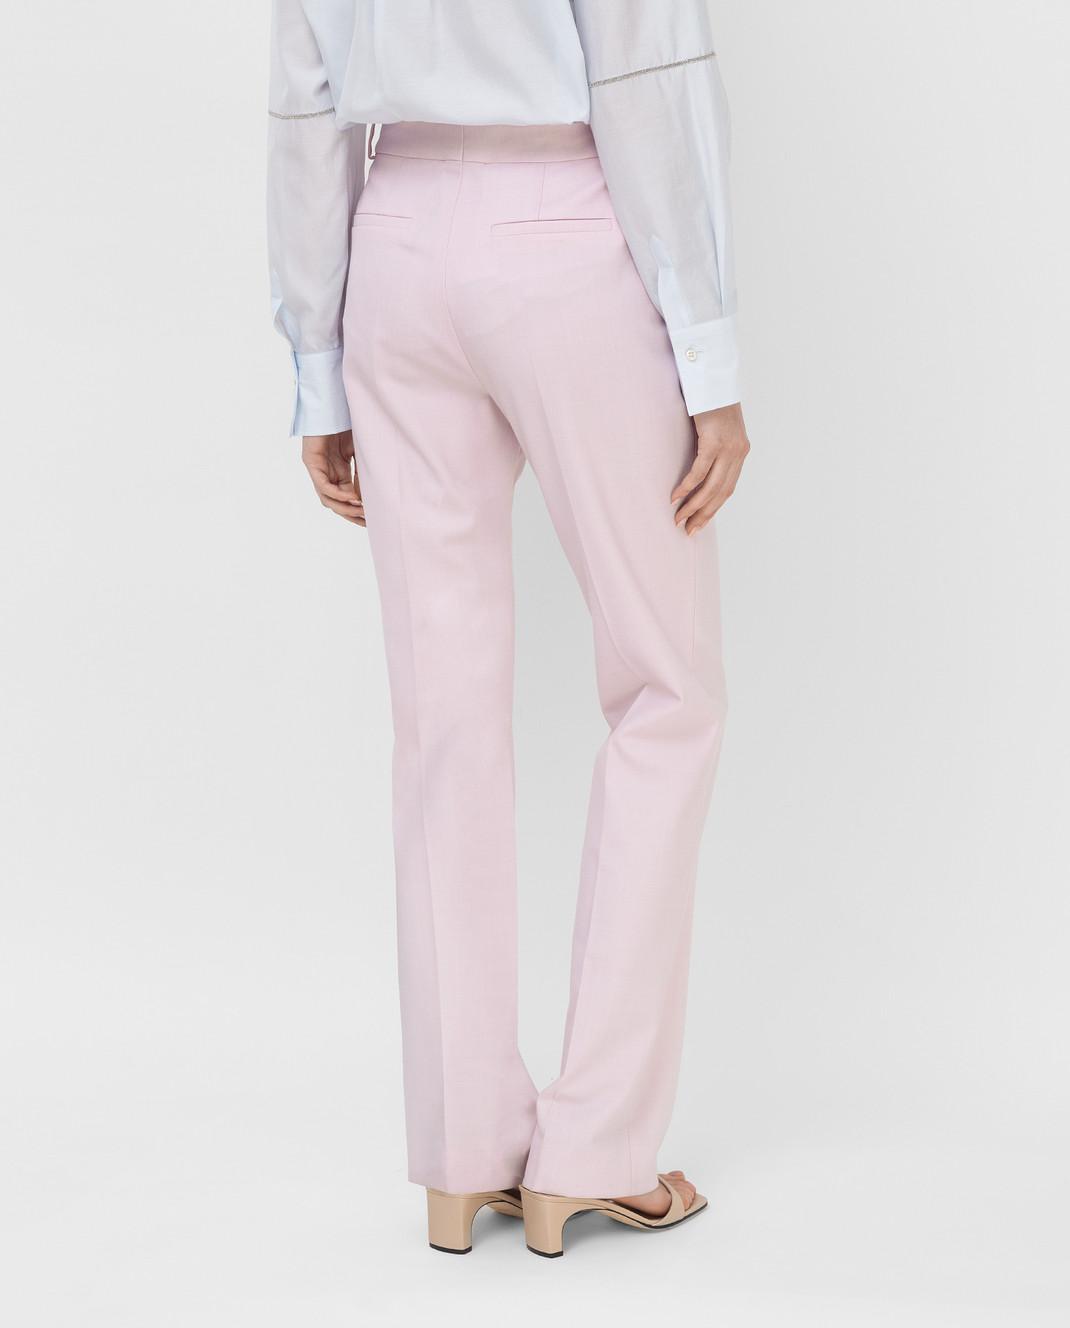 Victoria by Victoria Beckham Розовые брюки TRVV097 изображение 4